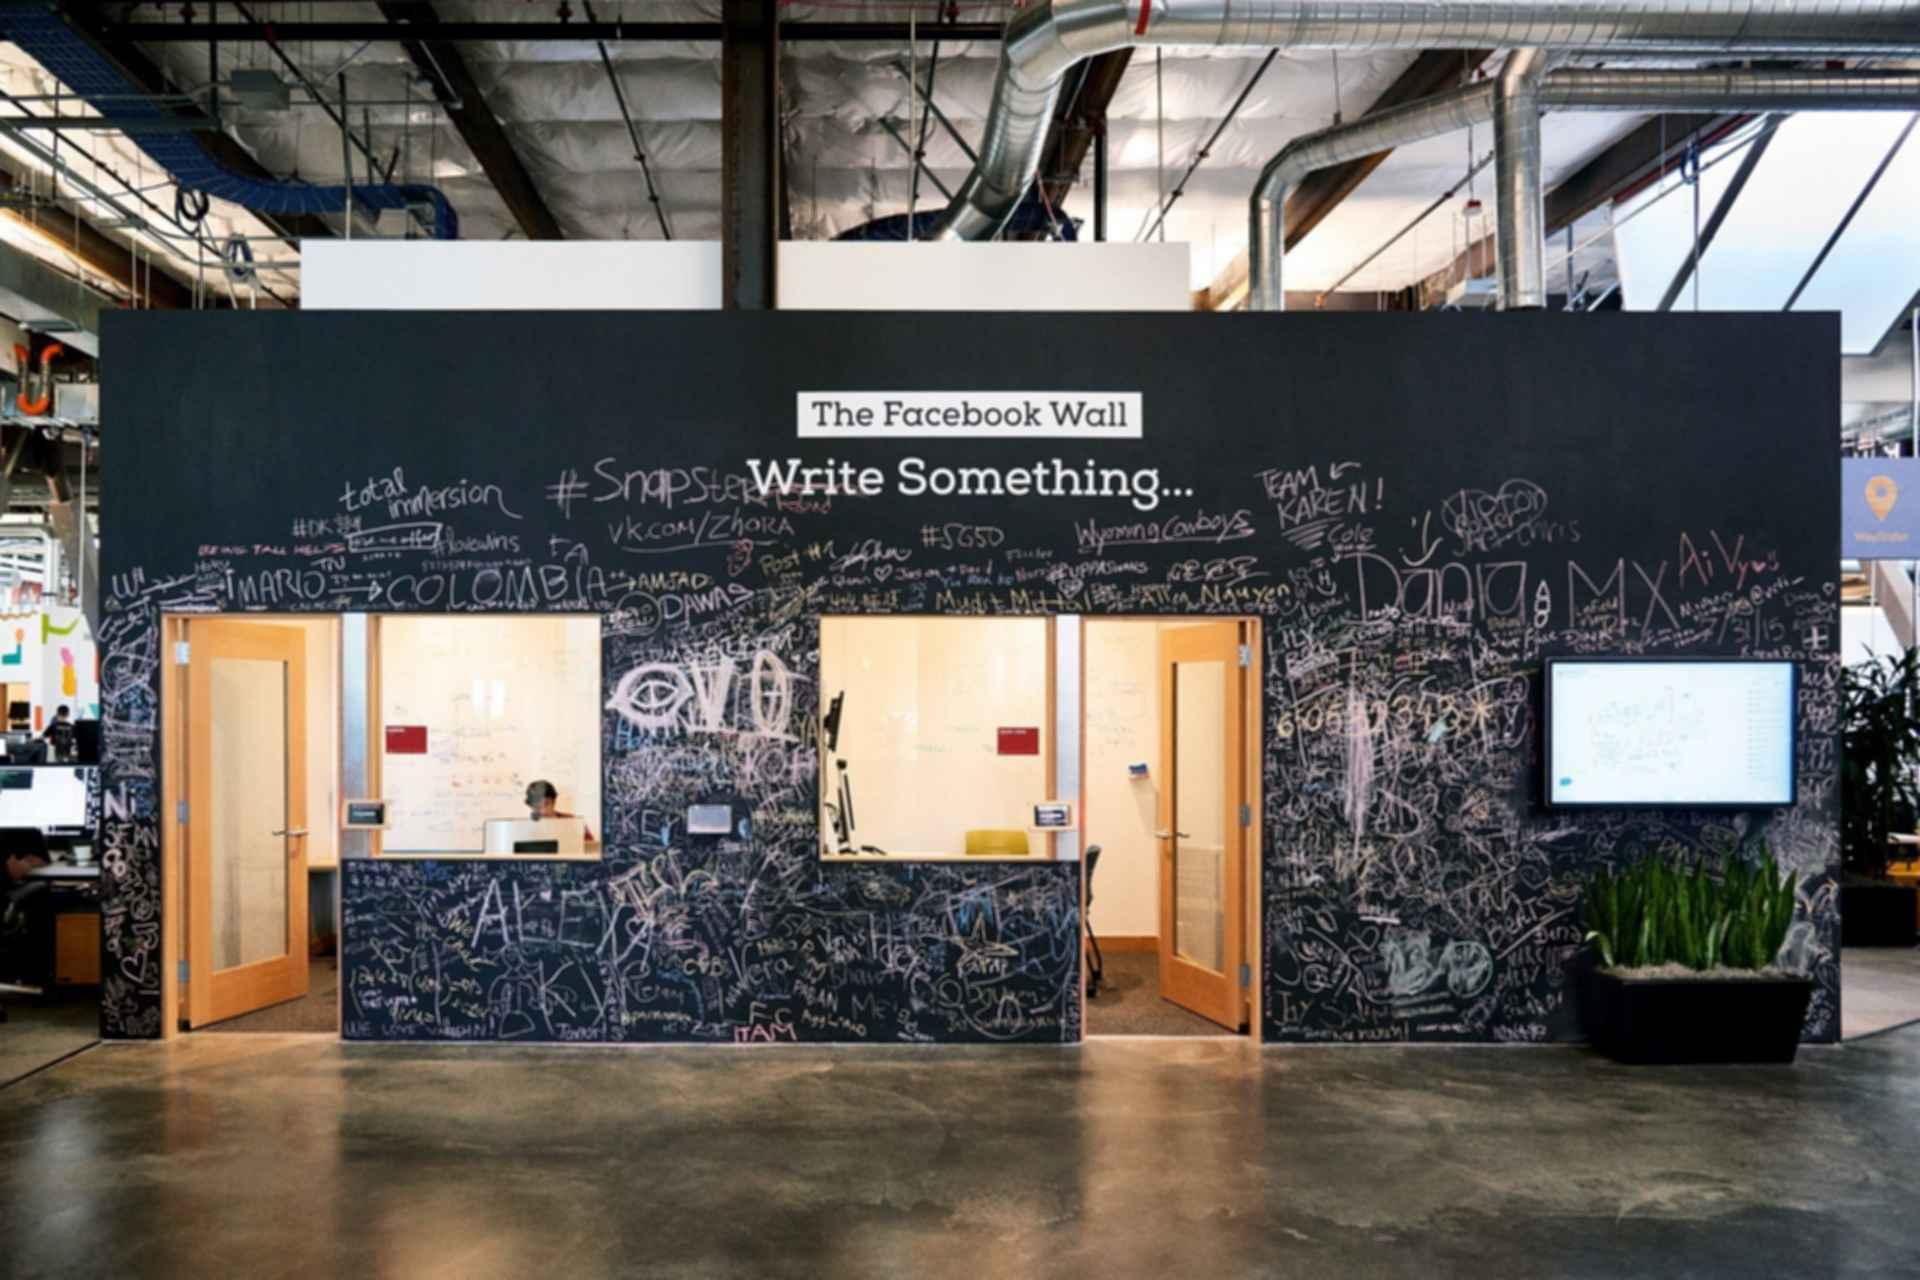 Facebook Headquarters Interior - 'The Facebook Wall'